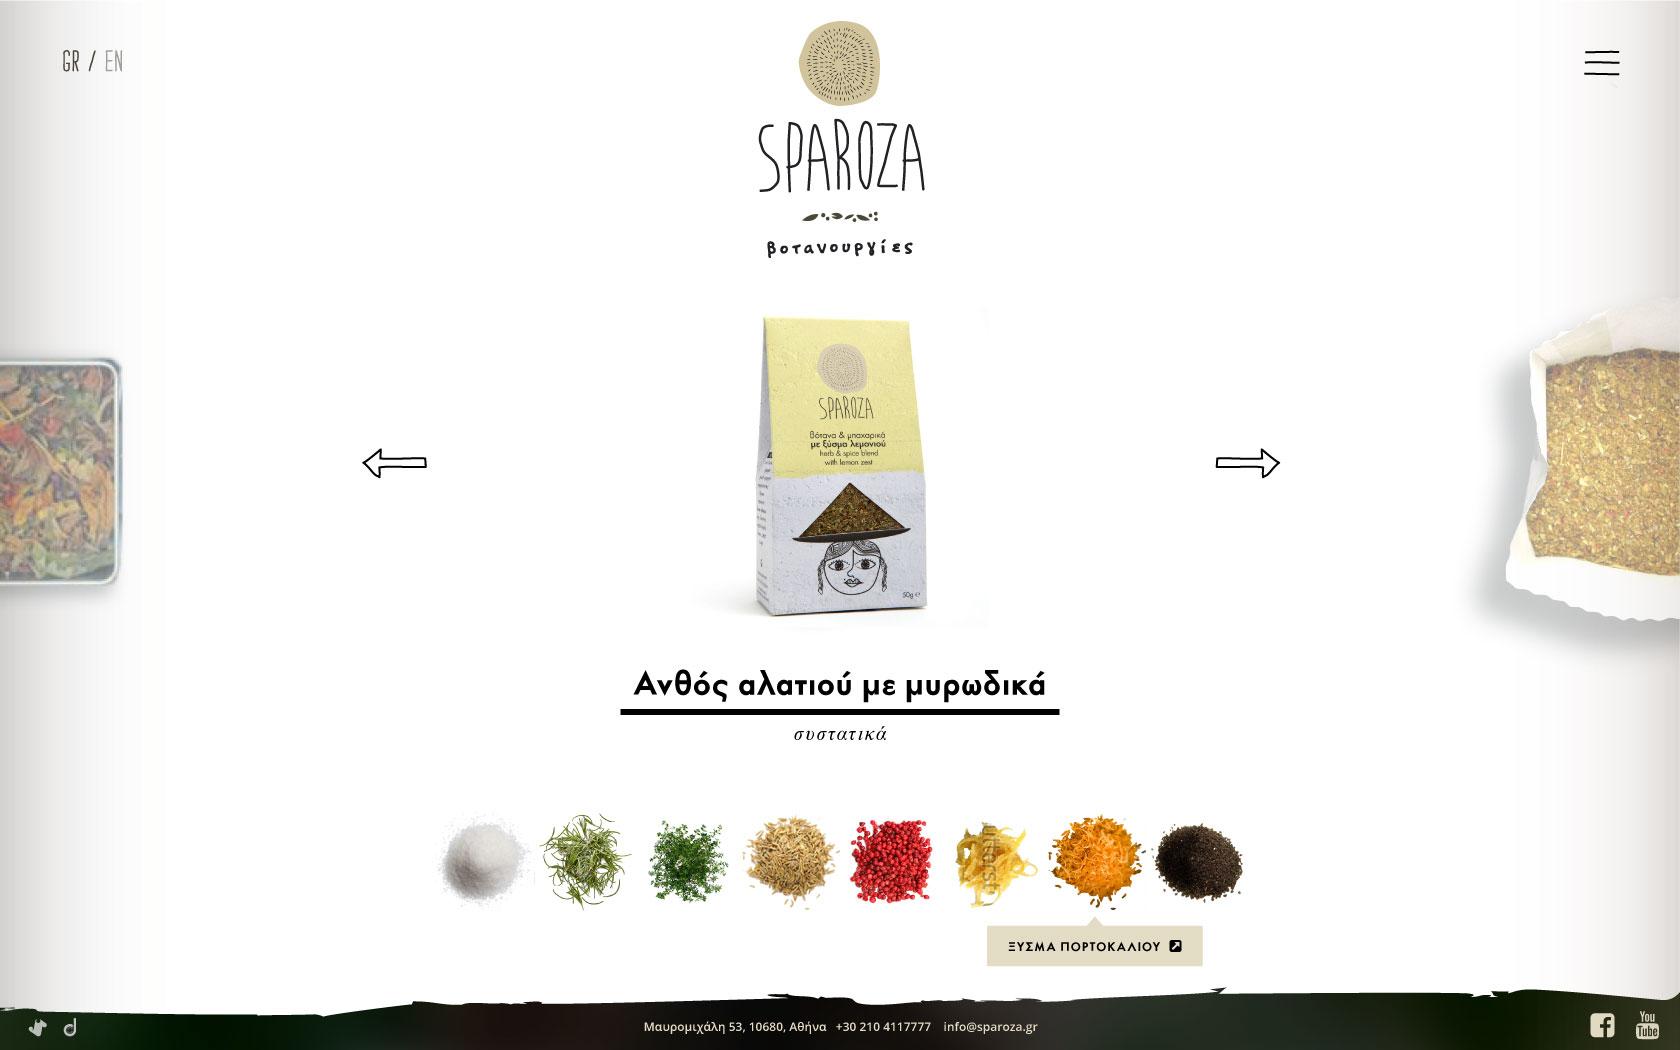 Sparoza_layout-2_Desktop_1-home2.jpg